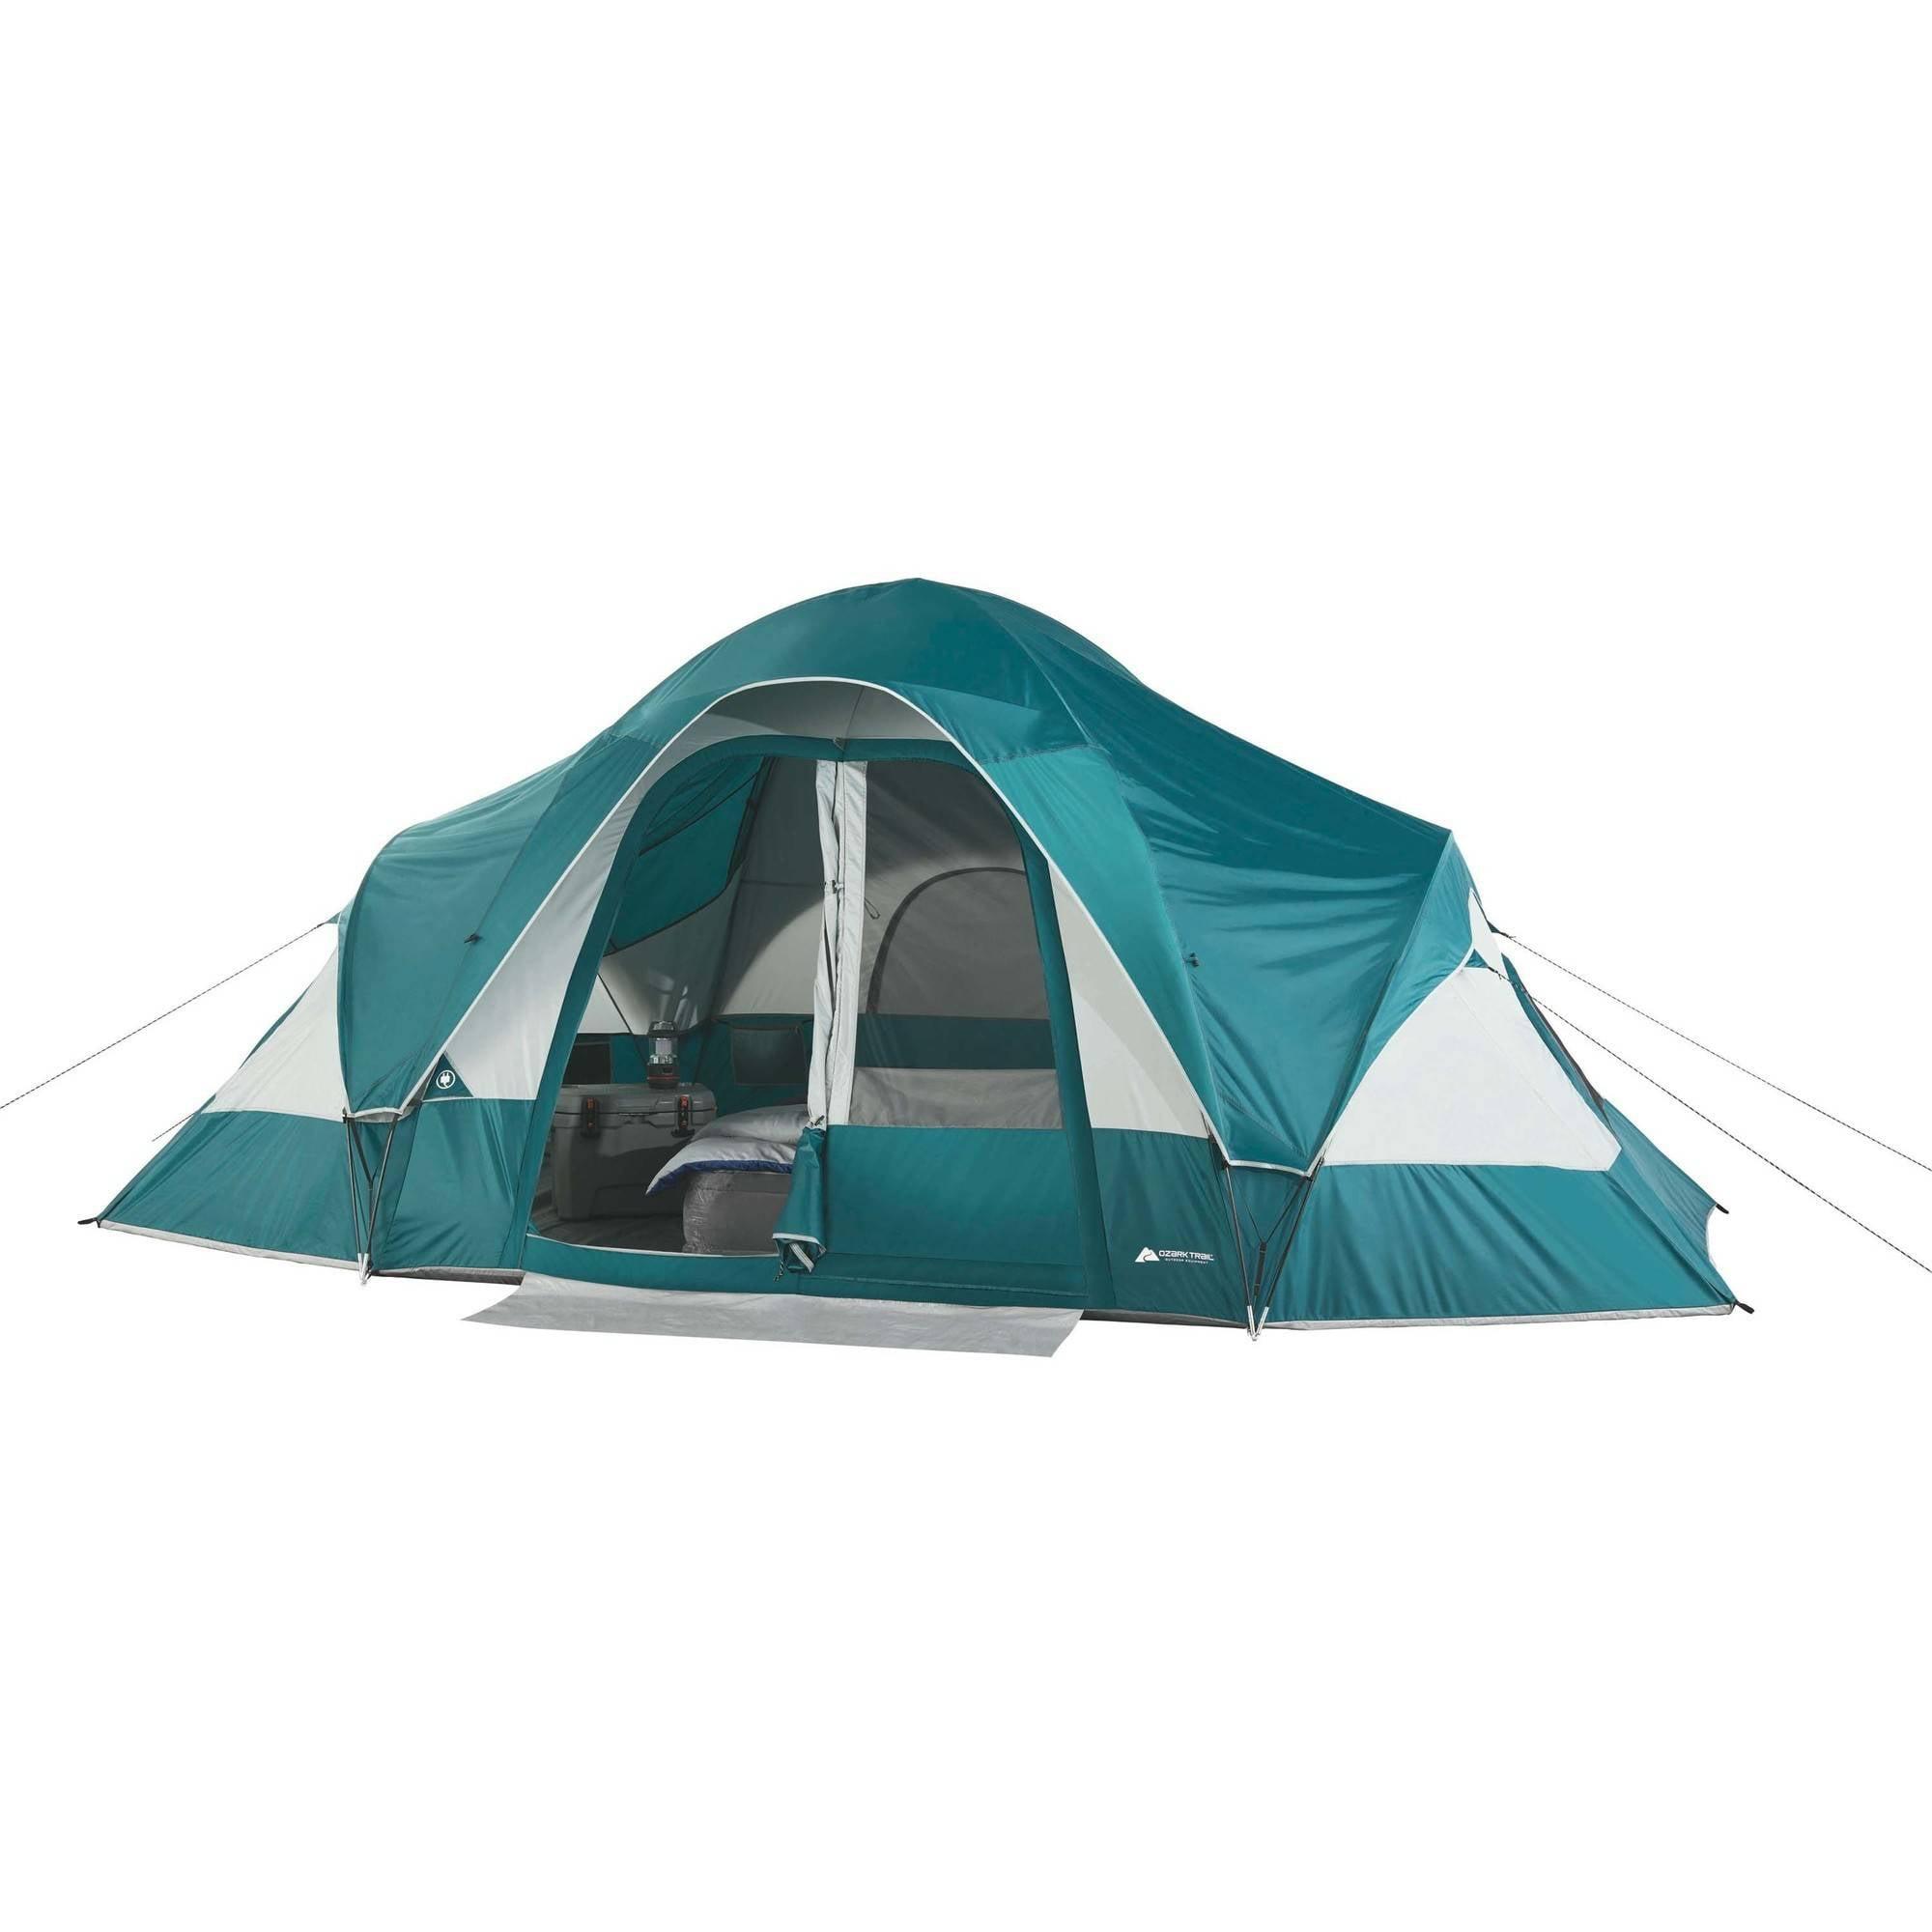 sc 1 st  Walmart & Ozark Trail 8-Person Family Tent - Walmart.com